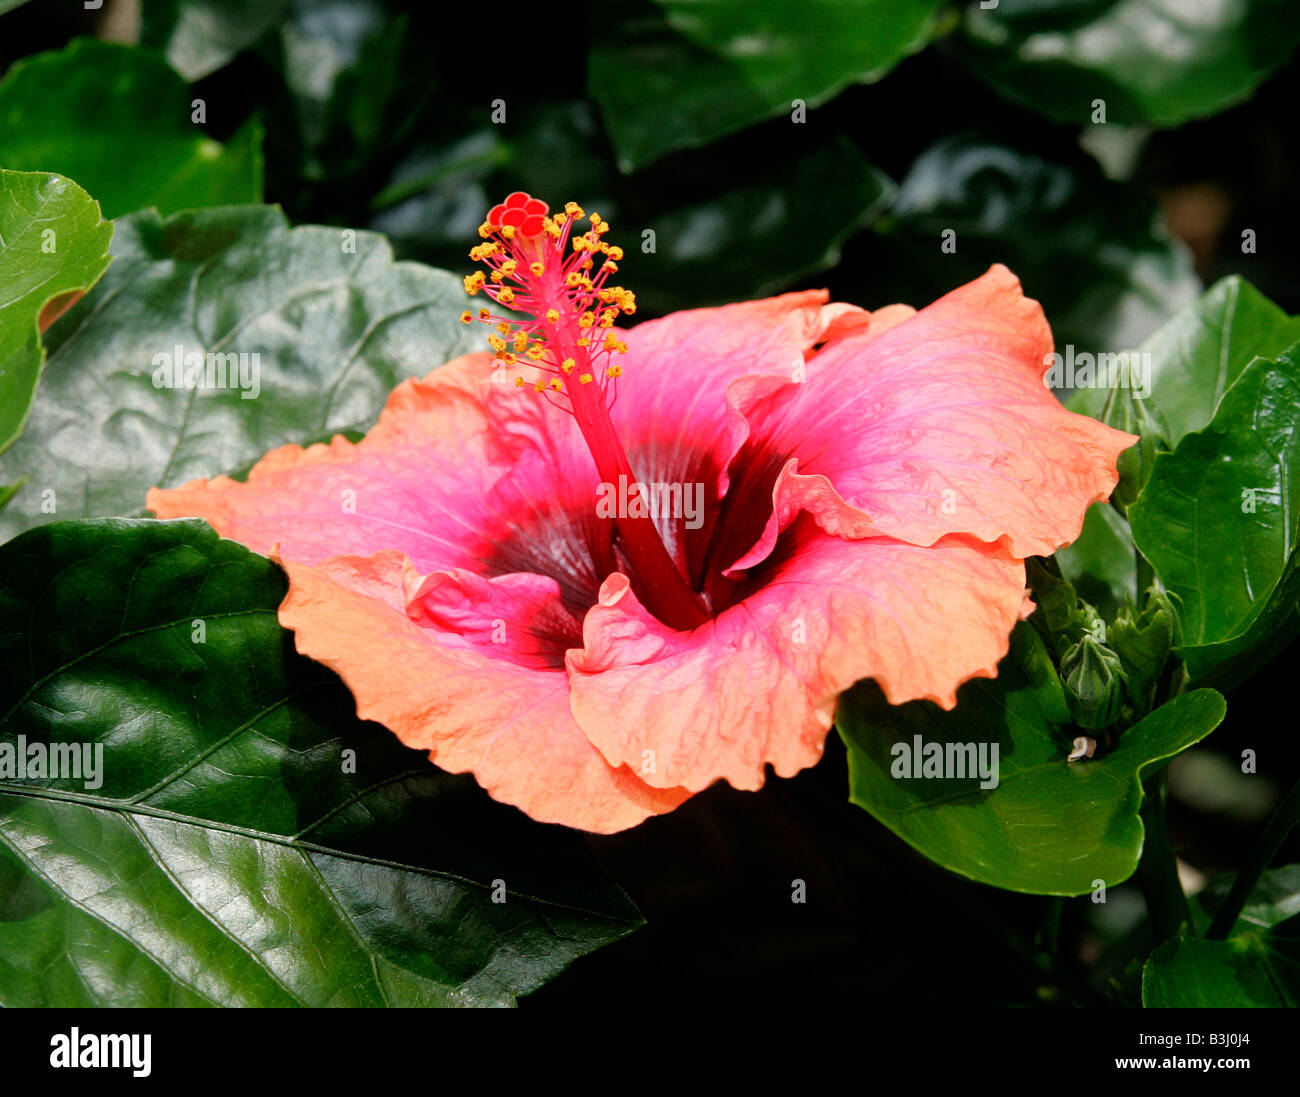 Chinese hibiscus stock photos chinese hibiscus stock images alamy an erin rachael chinese hibiscus flower stock image izmirmasajfo